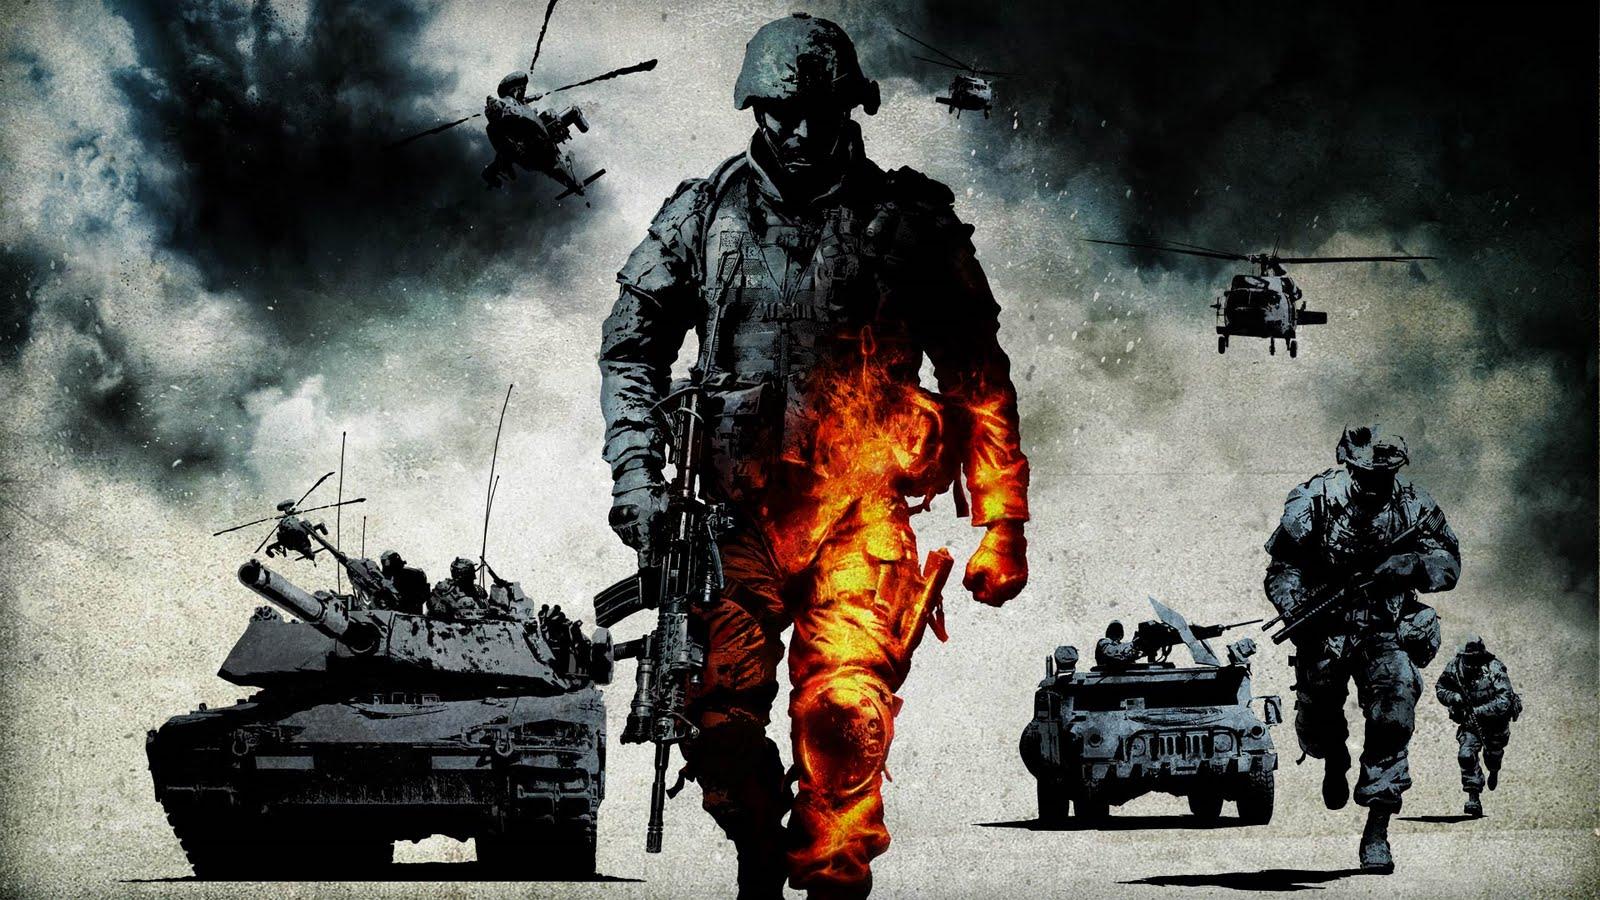 http://3.bp.blogspot.com/_2UbsSBz9ckE/S2C8vsAWUgI/AAAAAAAAAu4/jKQp0R6QMaU/s1600/Battlefield+Bad+Company+2+HD+wallpaper2.jpg